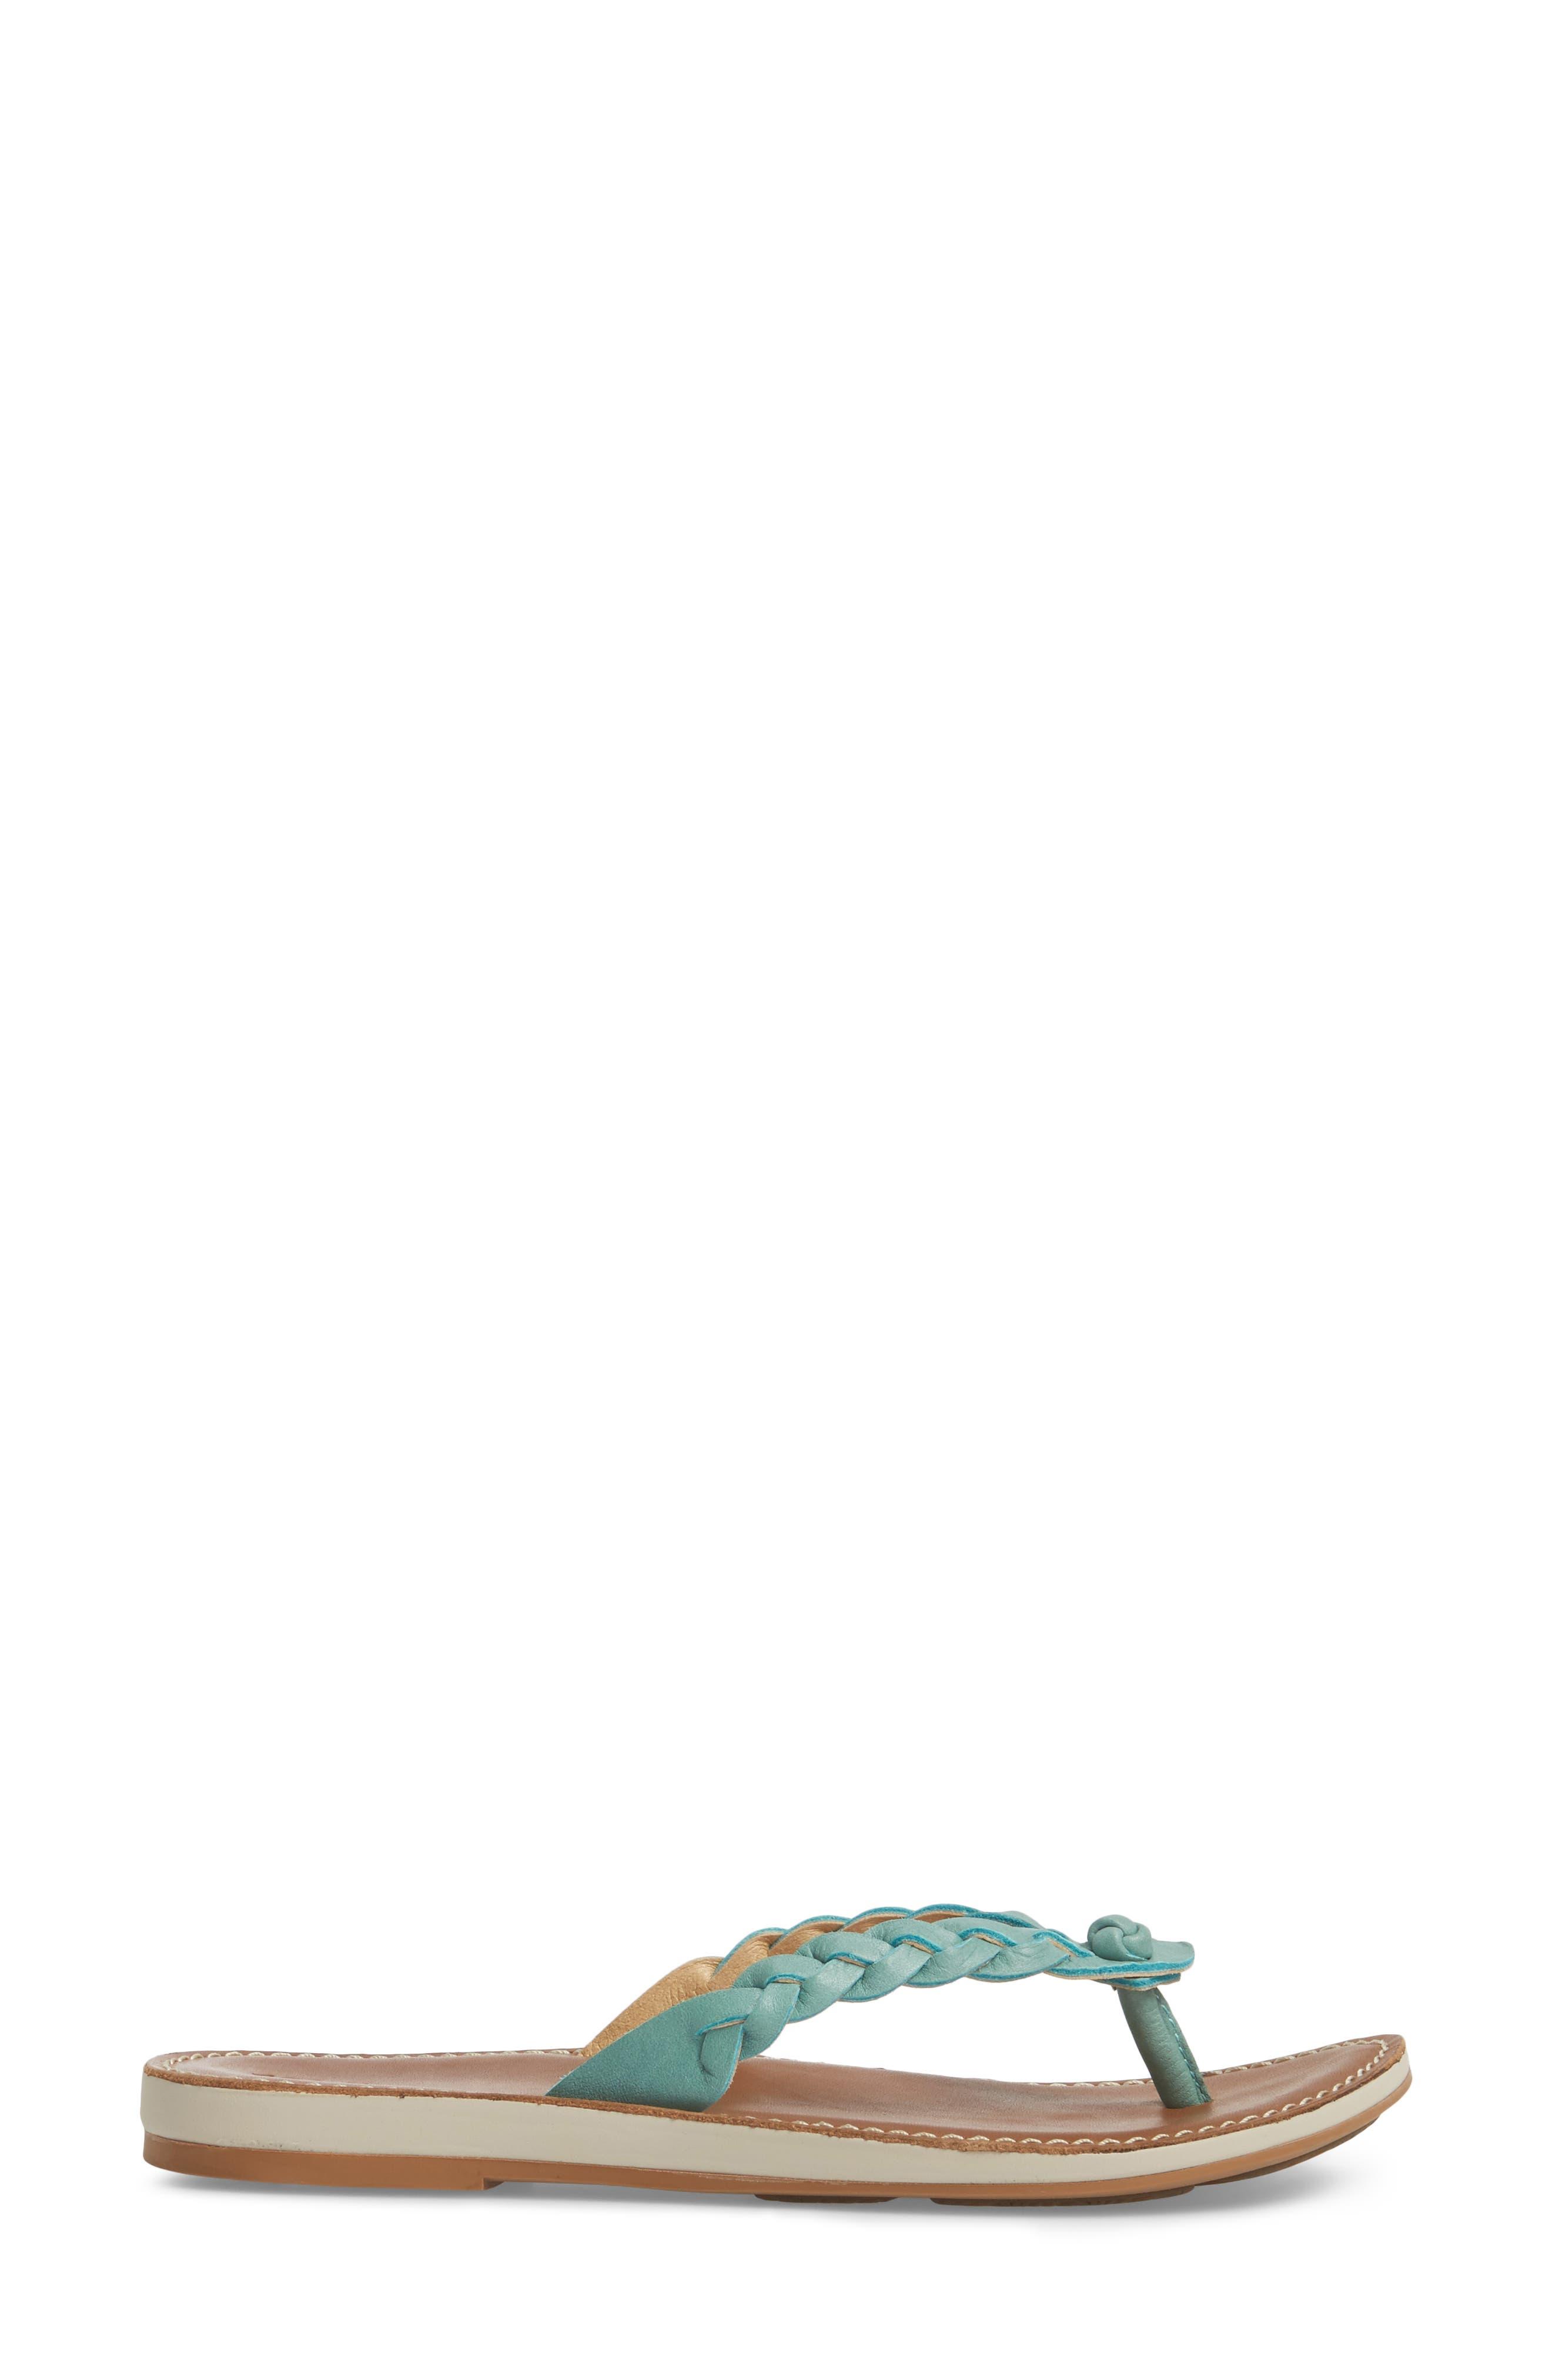 Kahiko Flip-Flop,                             Alternate thumbnail 3, color,                             Sea/ Tan Leather